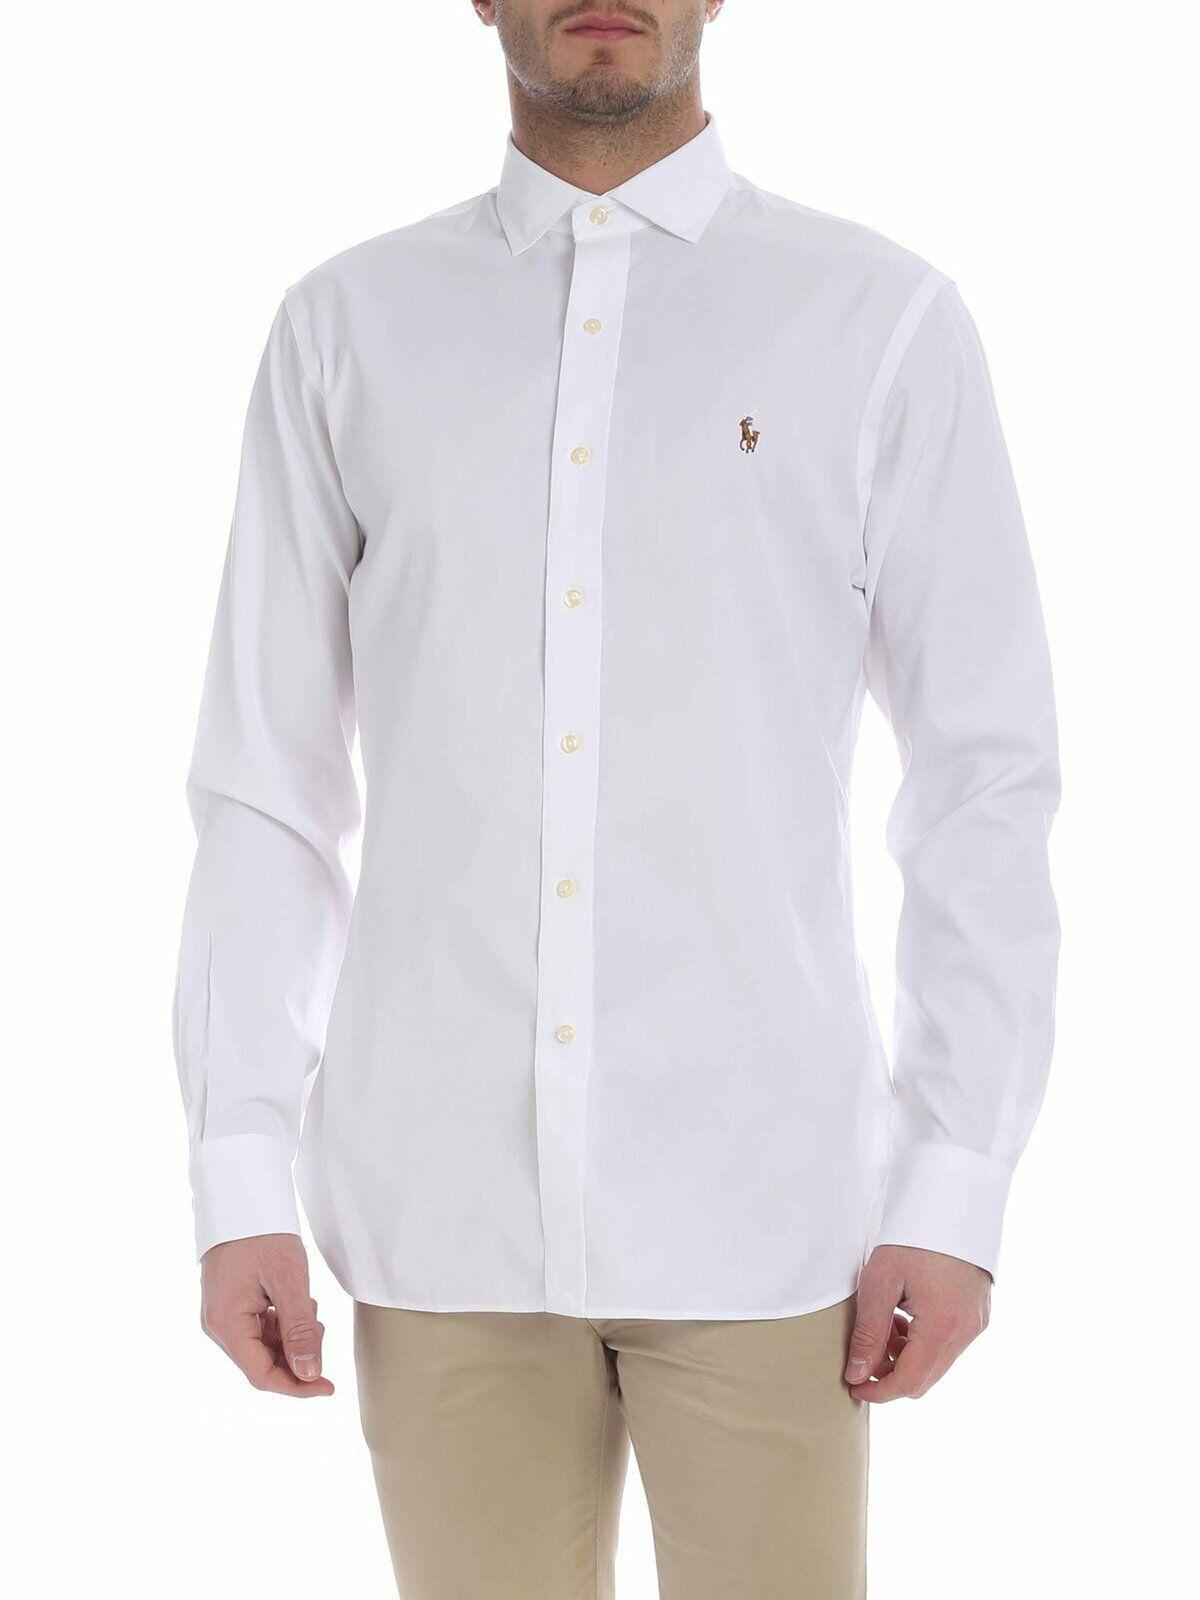 Ralph Lauren Men's Clothing Shirts - 712744645001   White   Spring Summer 19